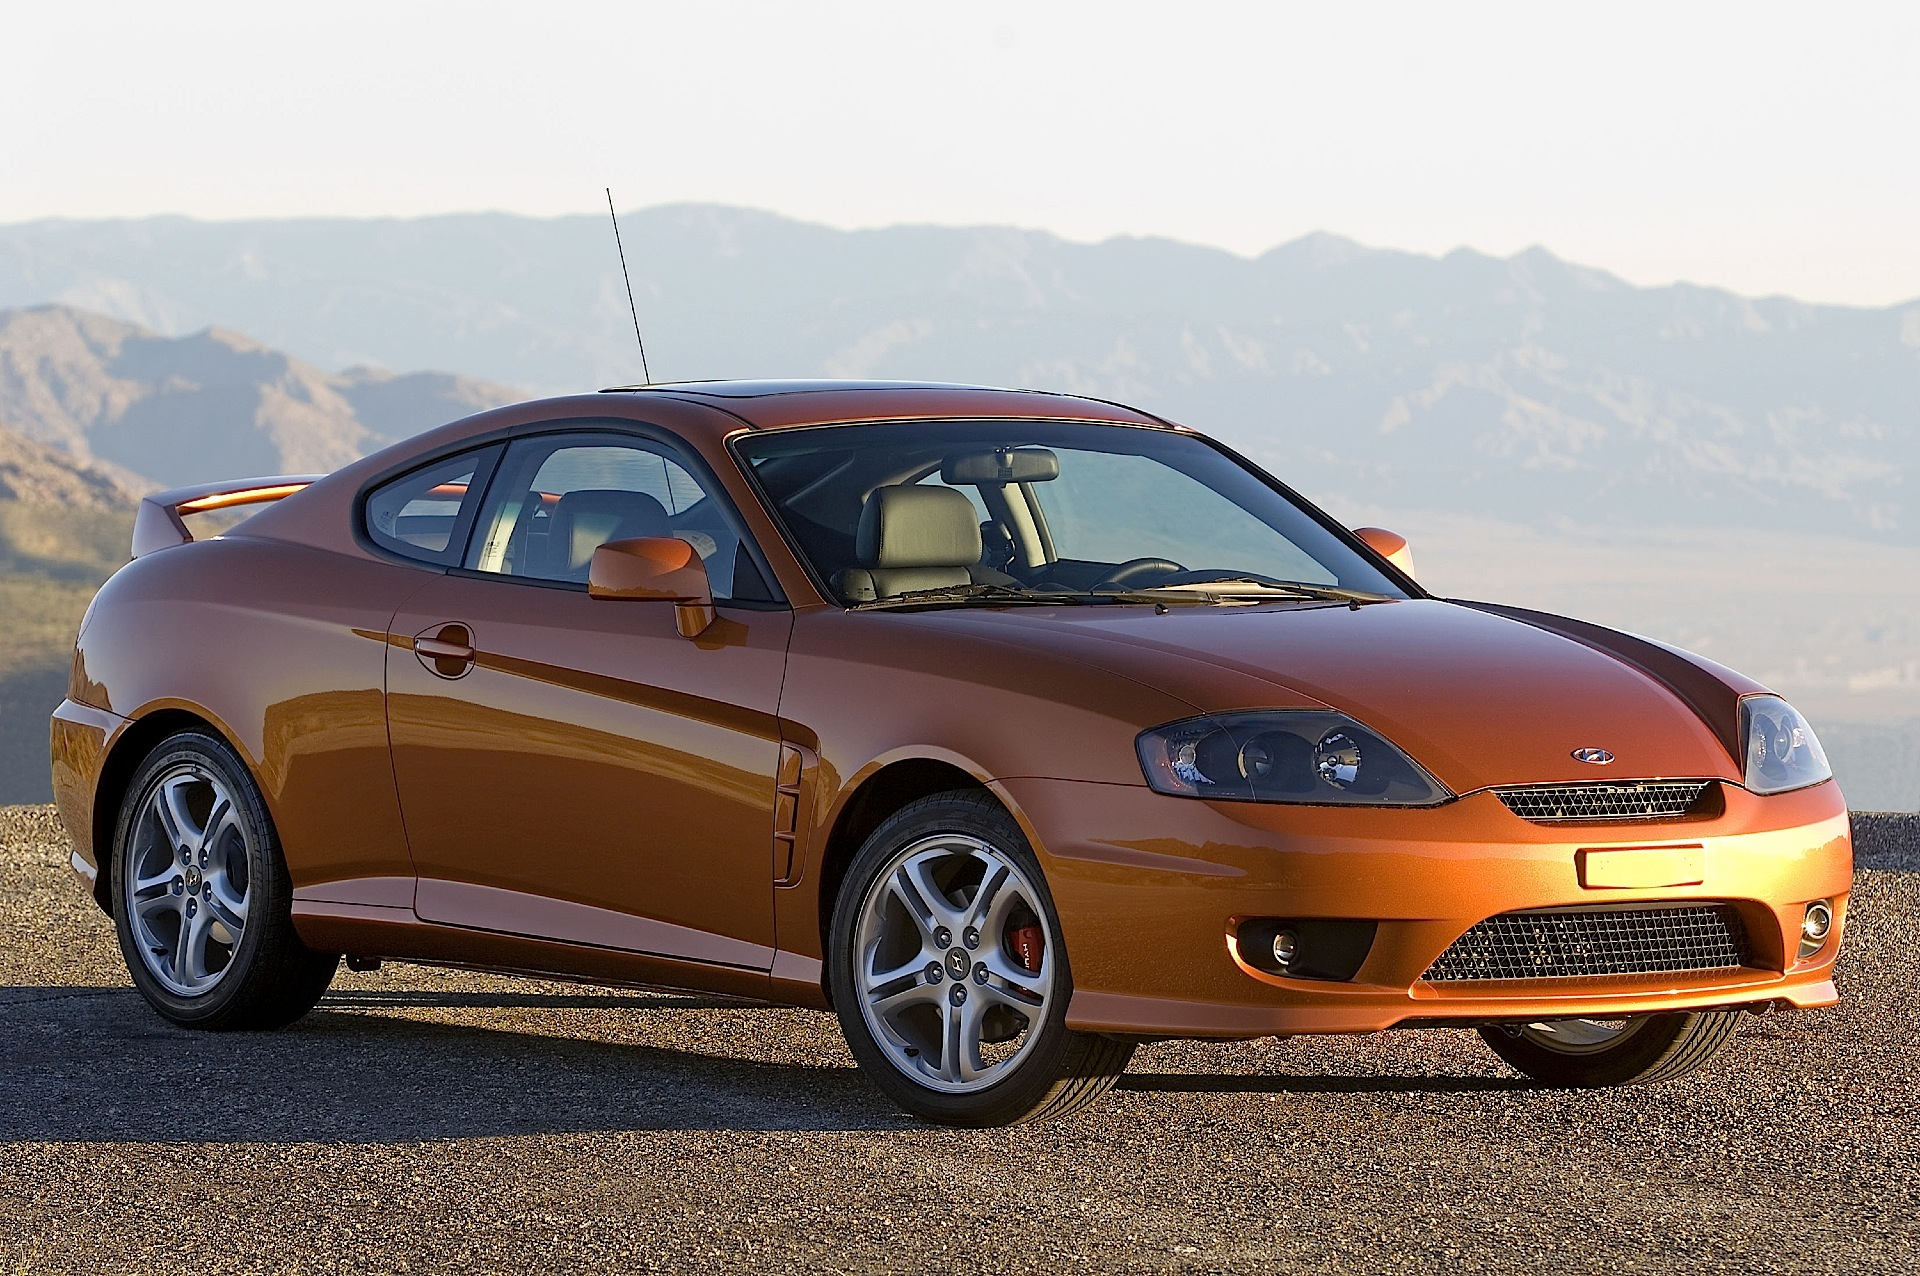 HYUNDAI Coupe / Tiburon - 2004, 2005, 2006, 2007 ...